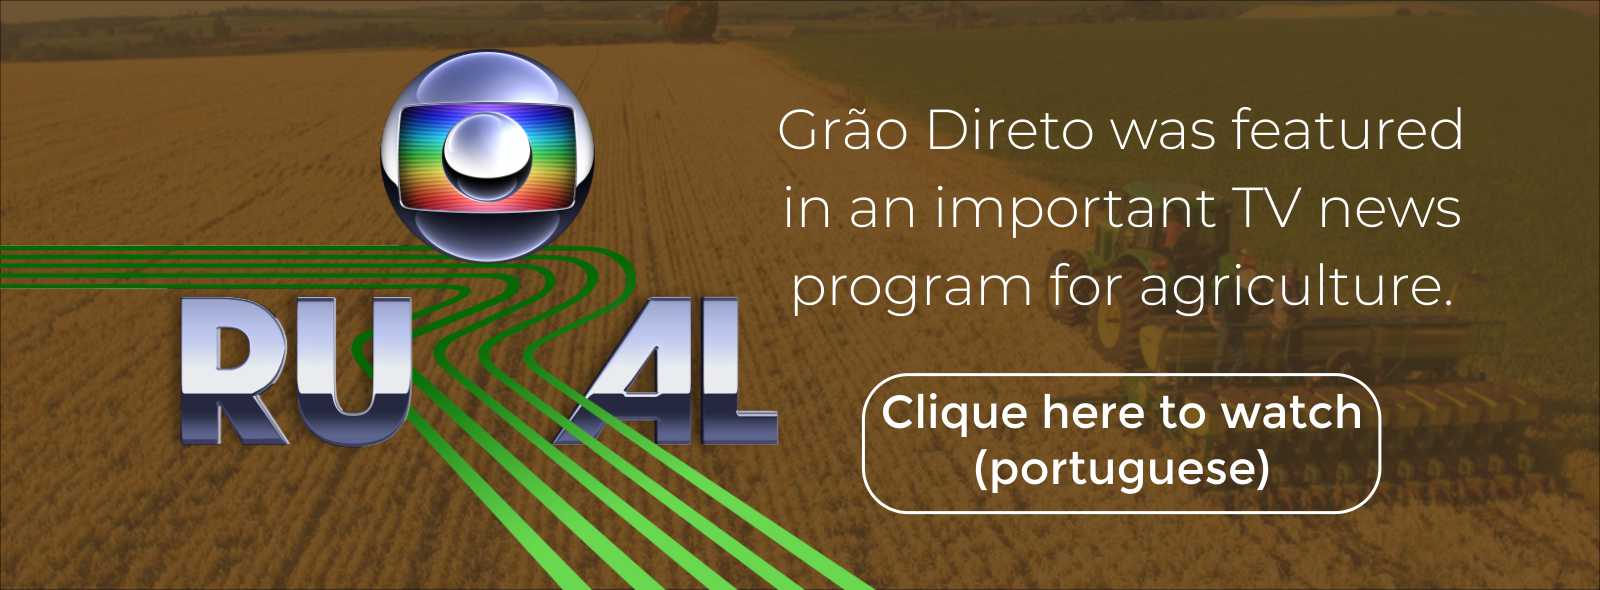 Grão Direto | Technology connecting Farmers and Grain buyers